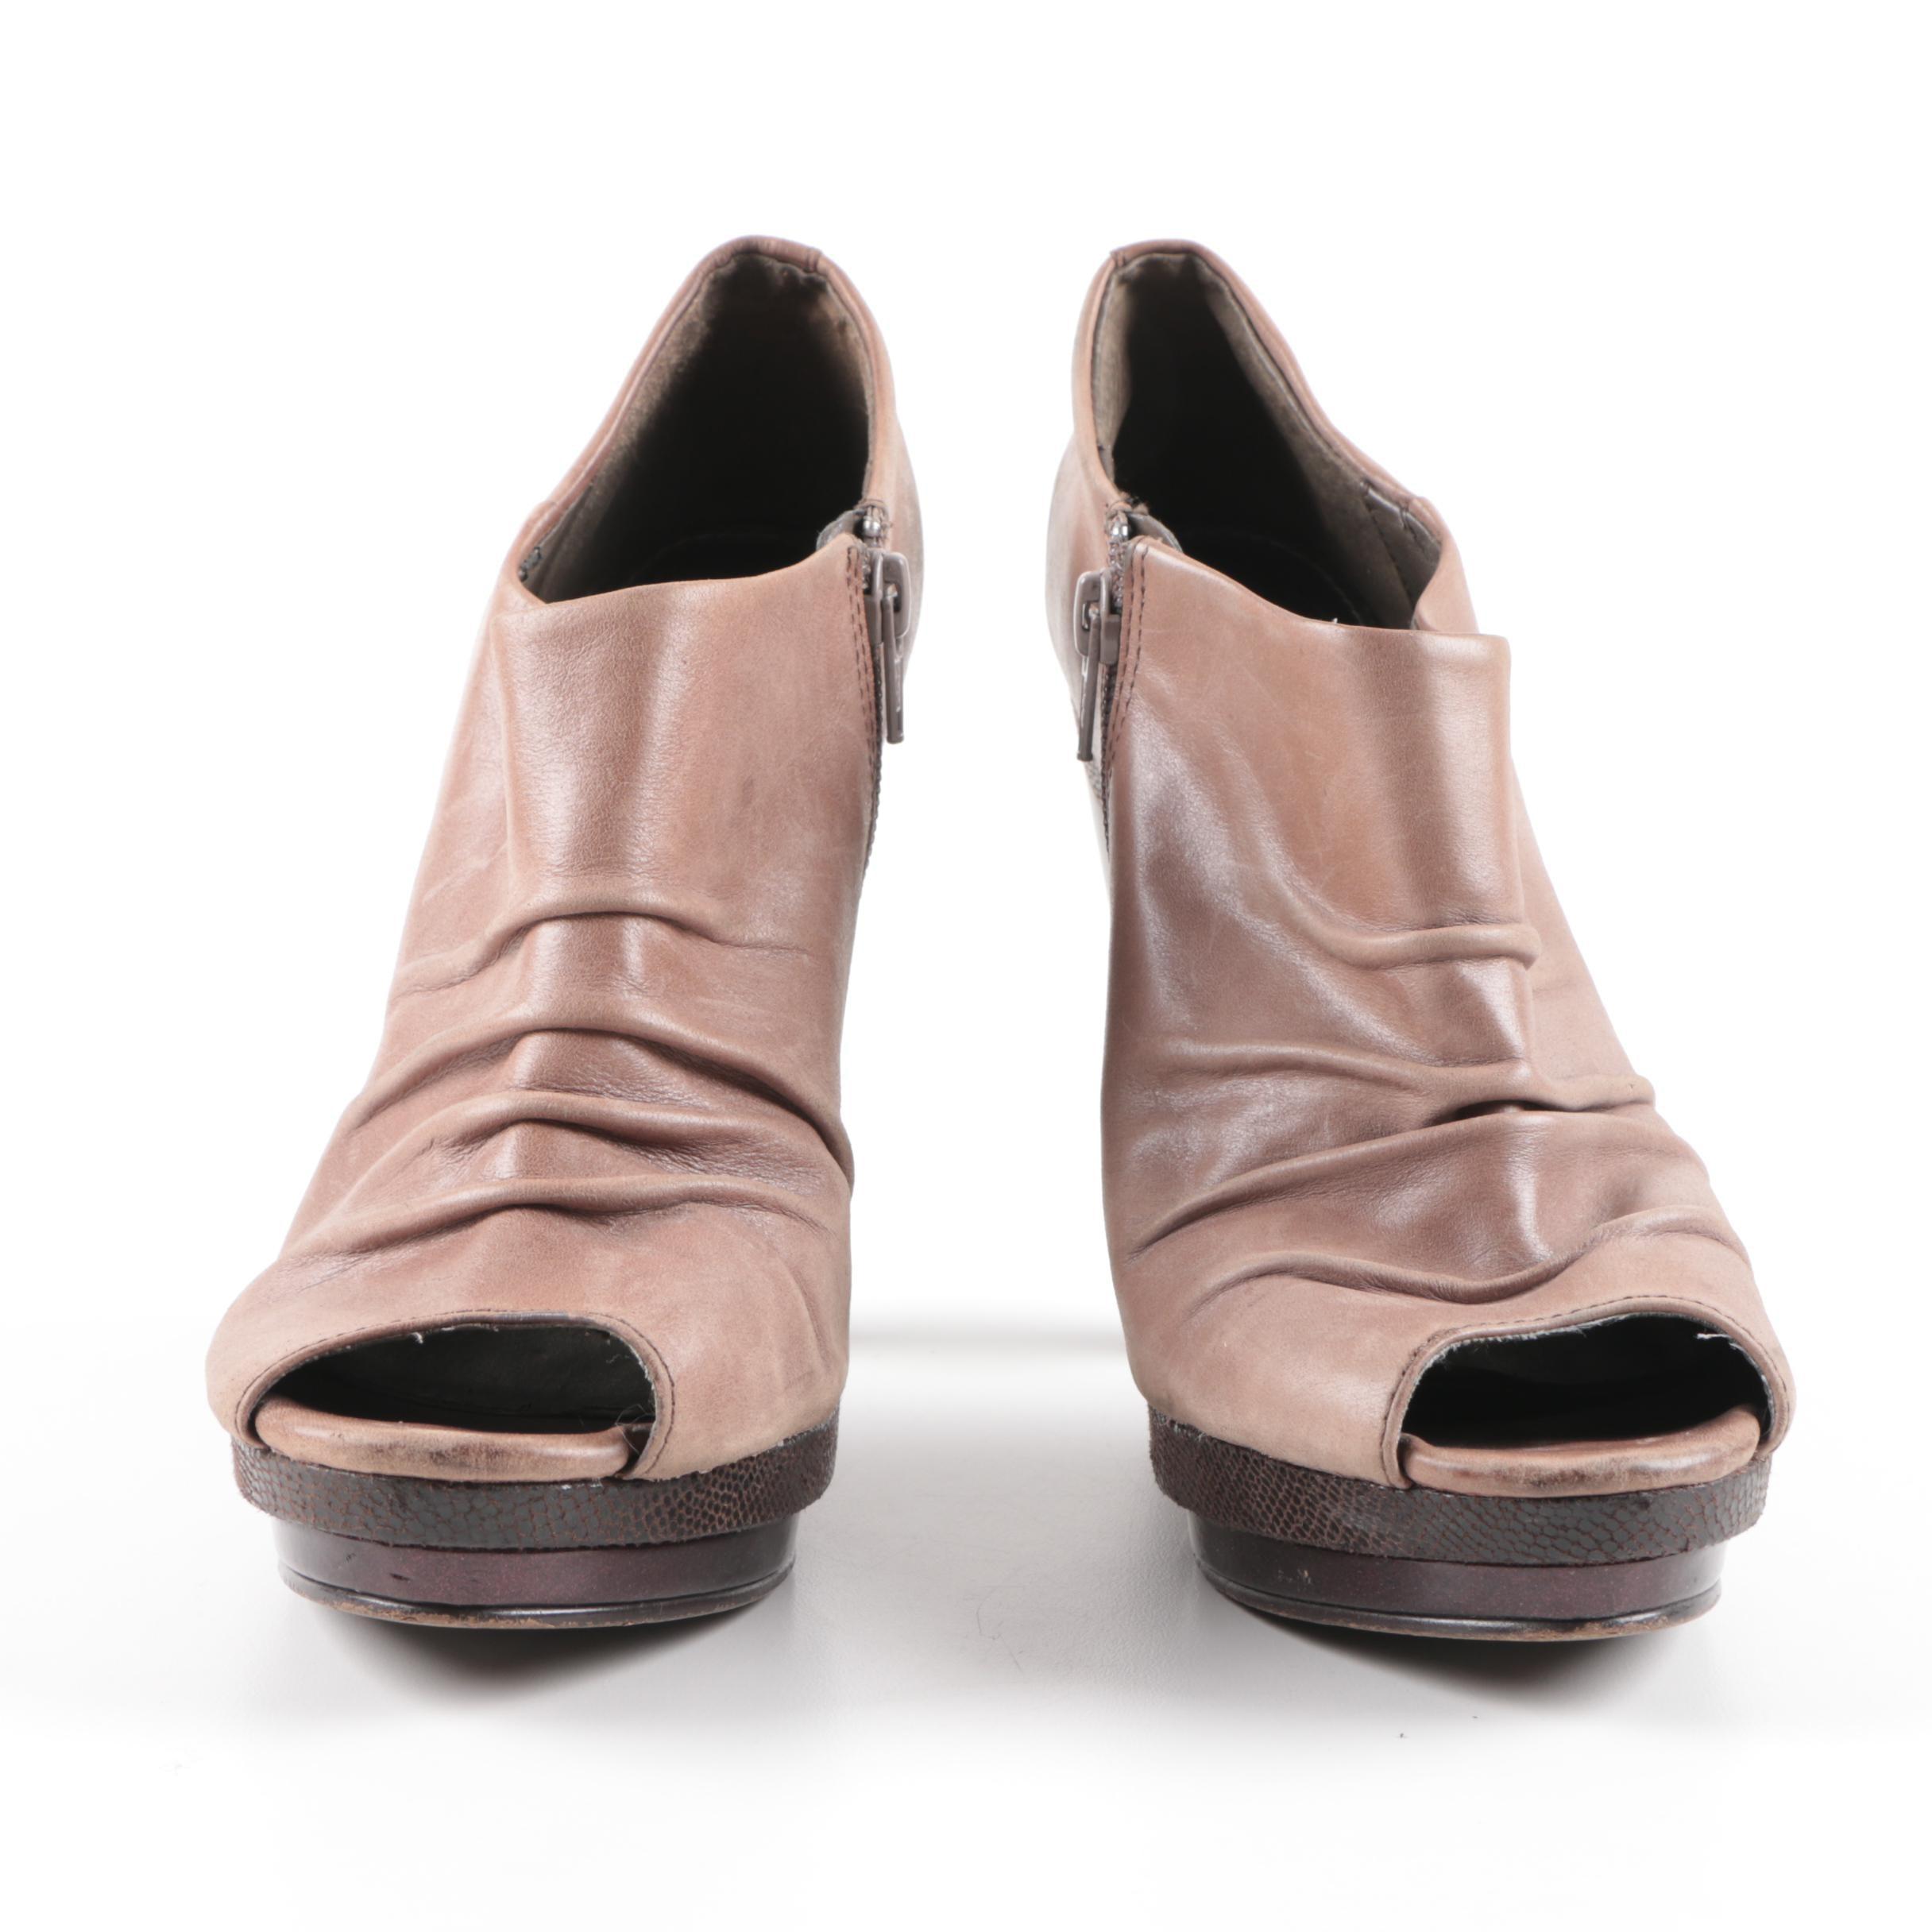 Fergie Turbulent Leather High Heels